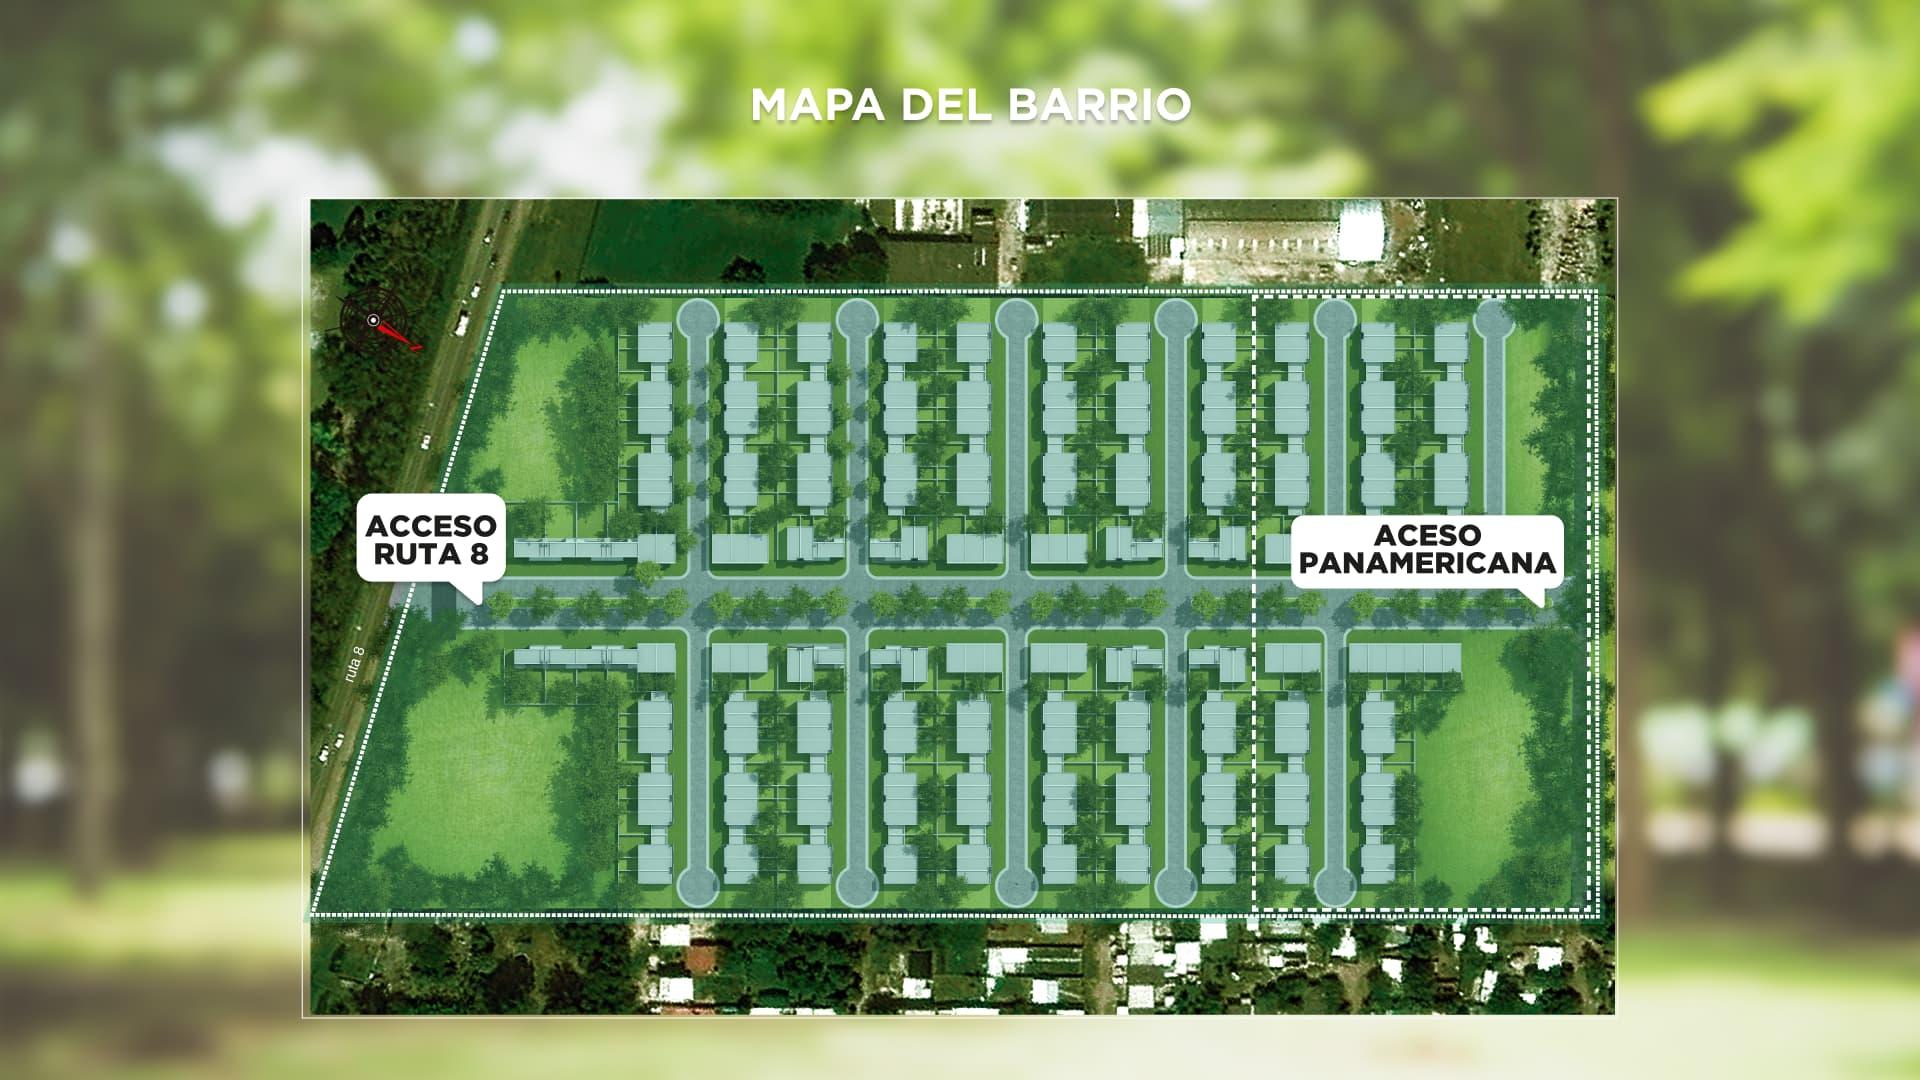 Mapa-del-barrio1.jpg